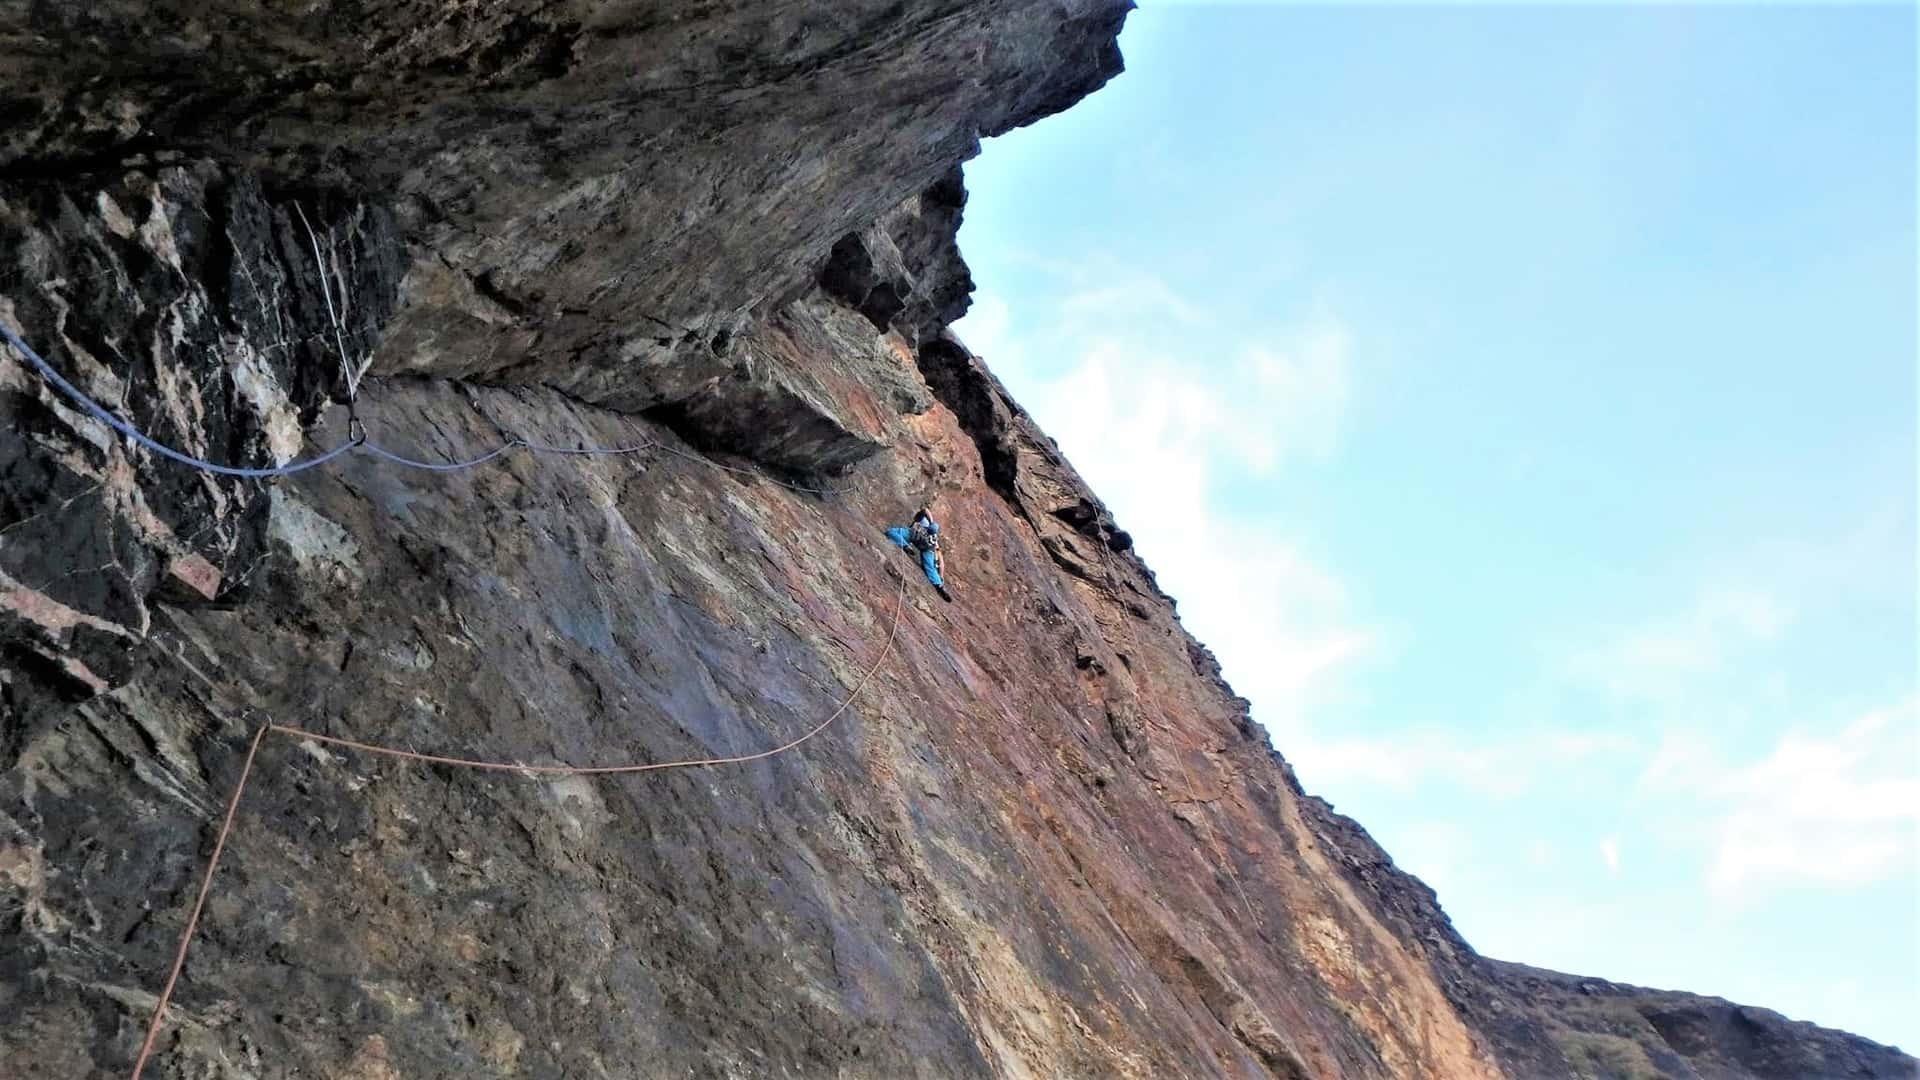 Climbing Mercury, E2, at Carn Gowla near St. Agnes in Cornwall